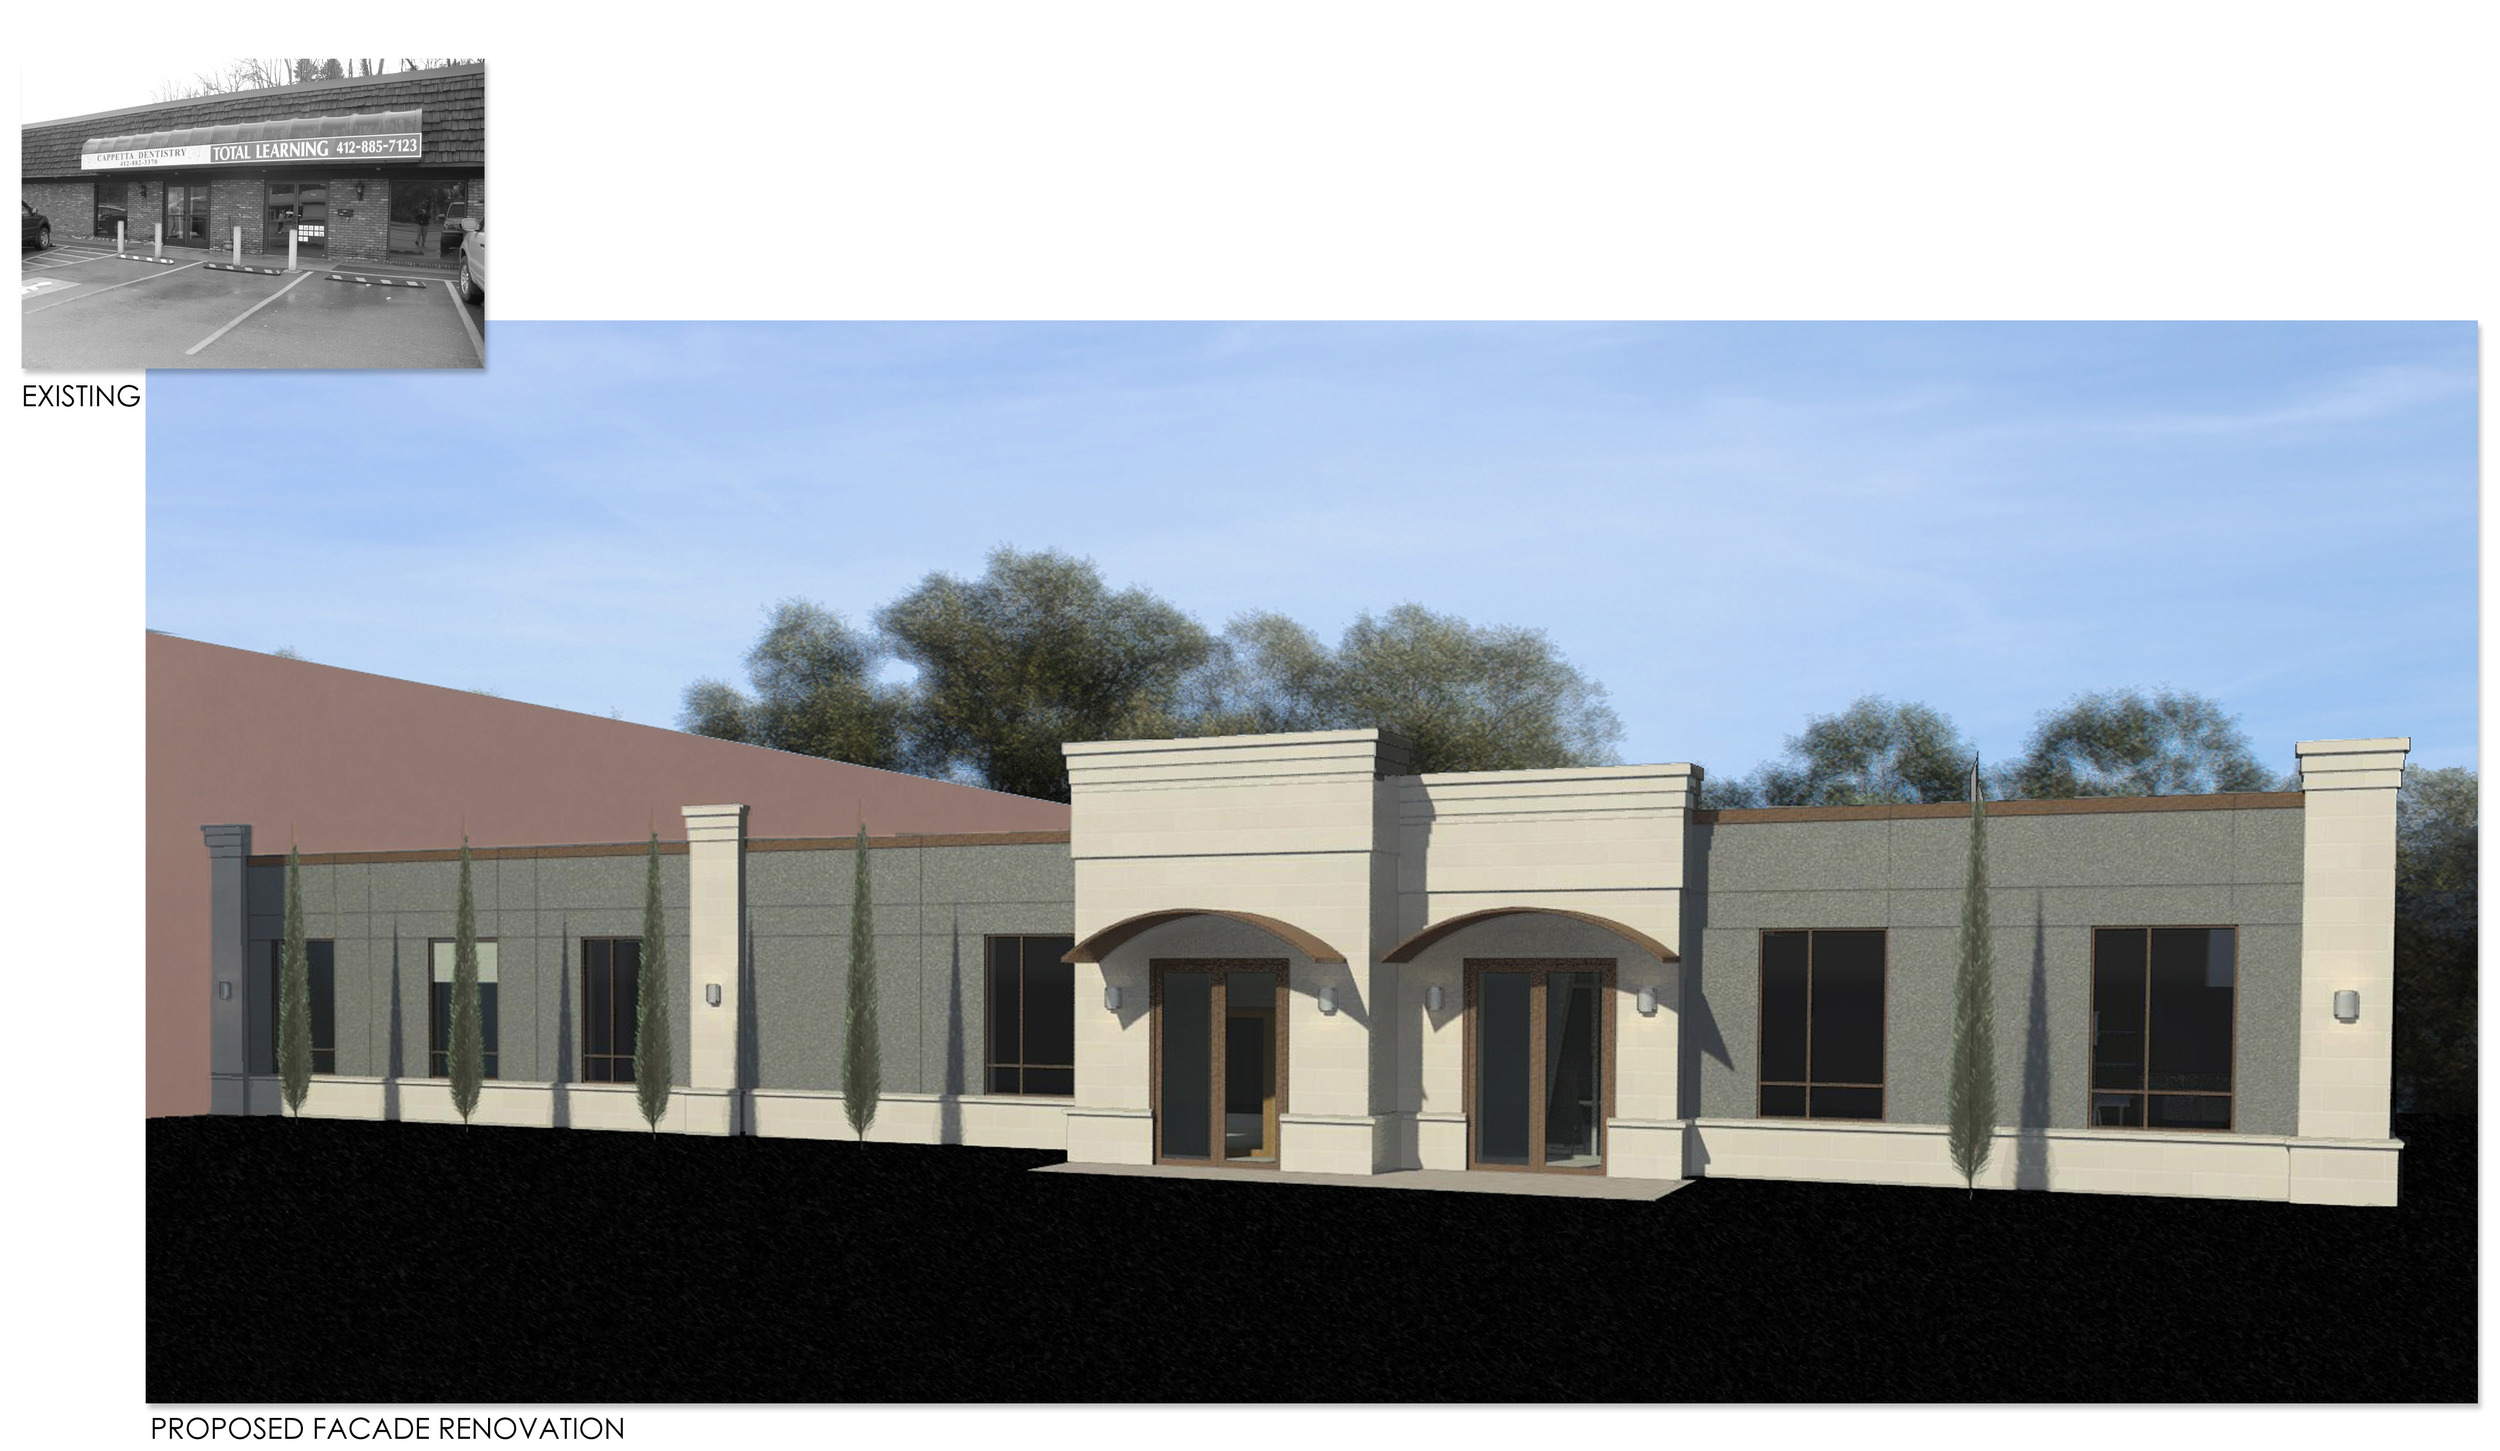 PROCESS: Proposed facade renovation